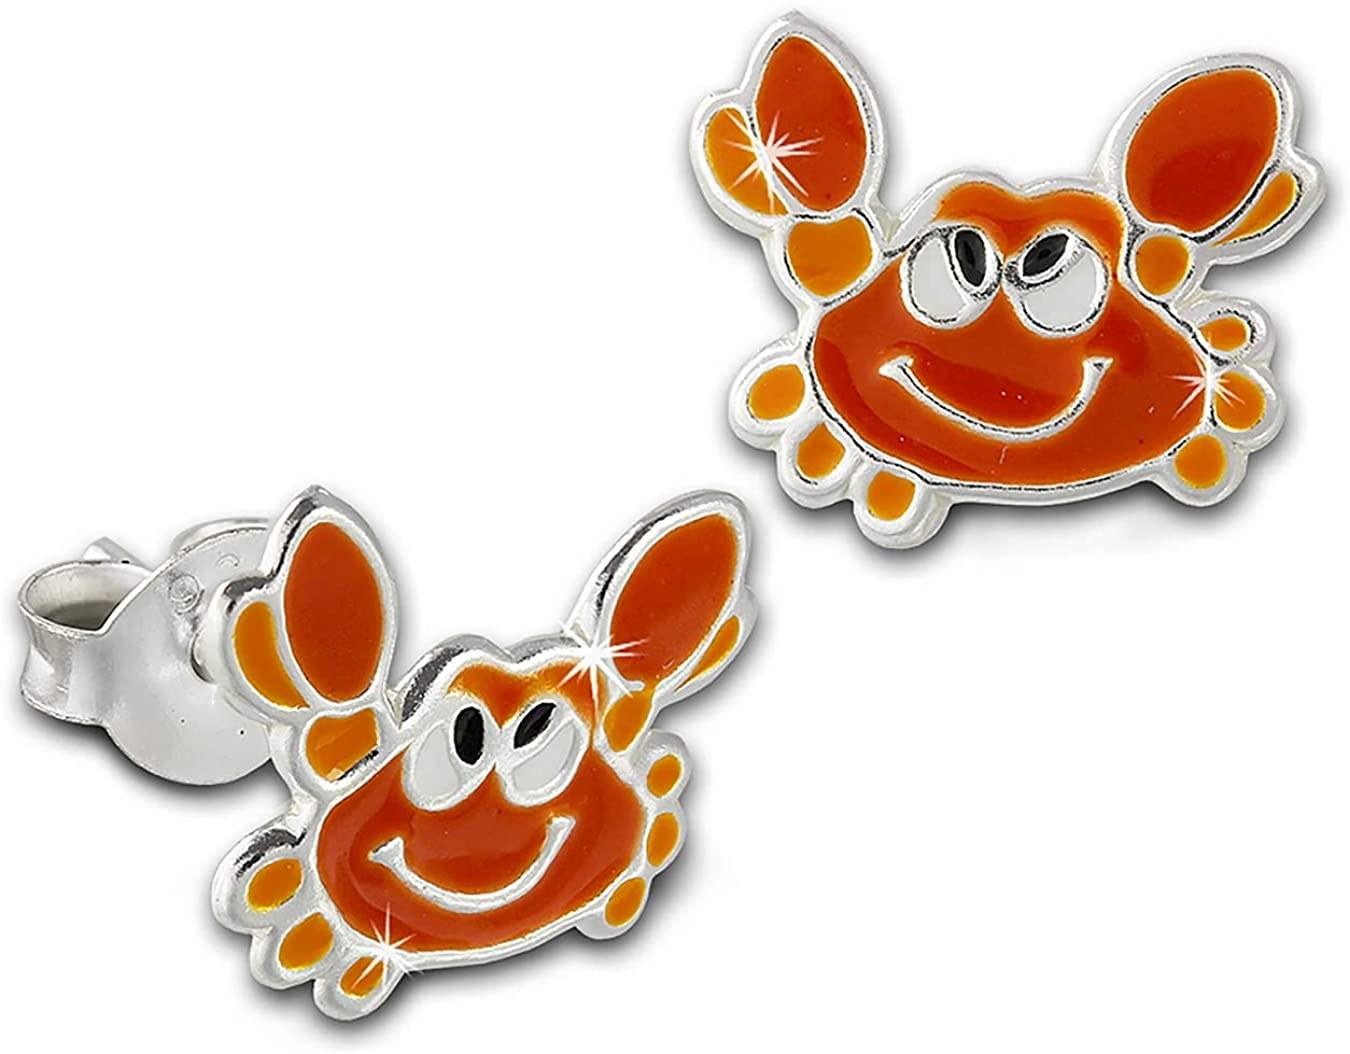 Tee-Wee children stud earrings crab with orange enamel, 925 Sterling Silver SDO8136O